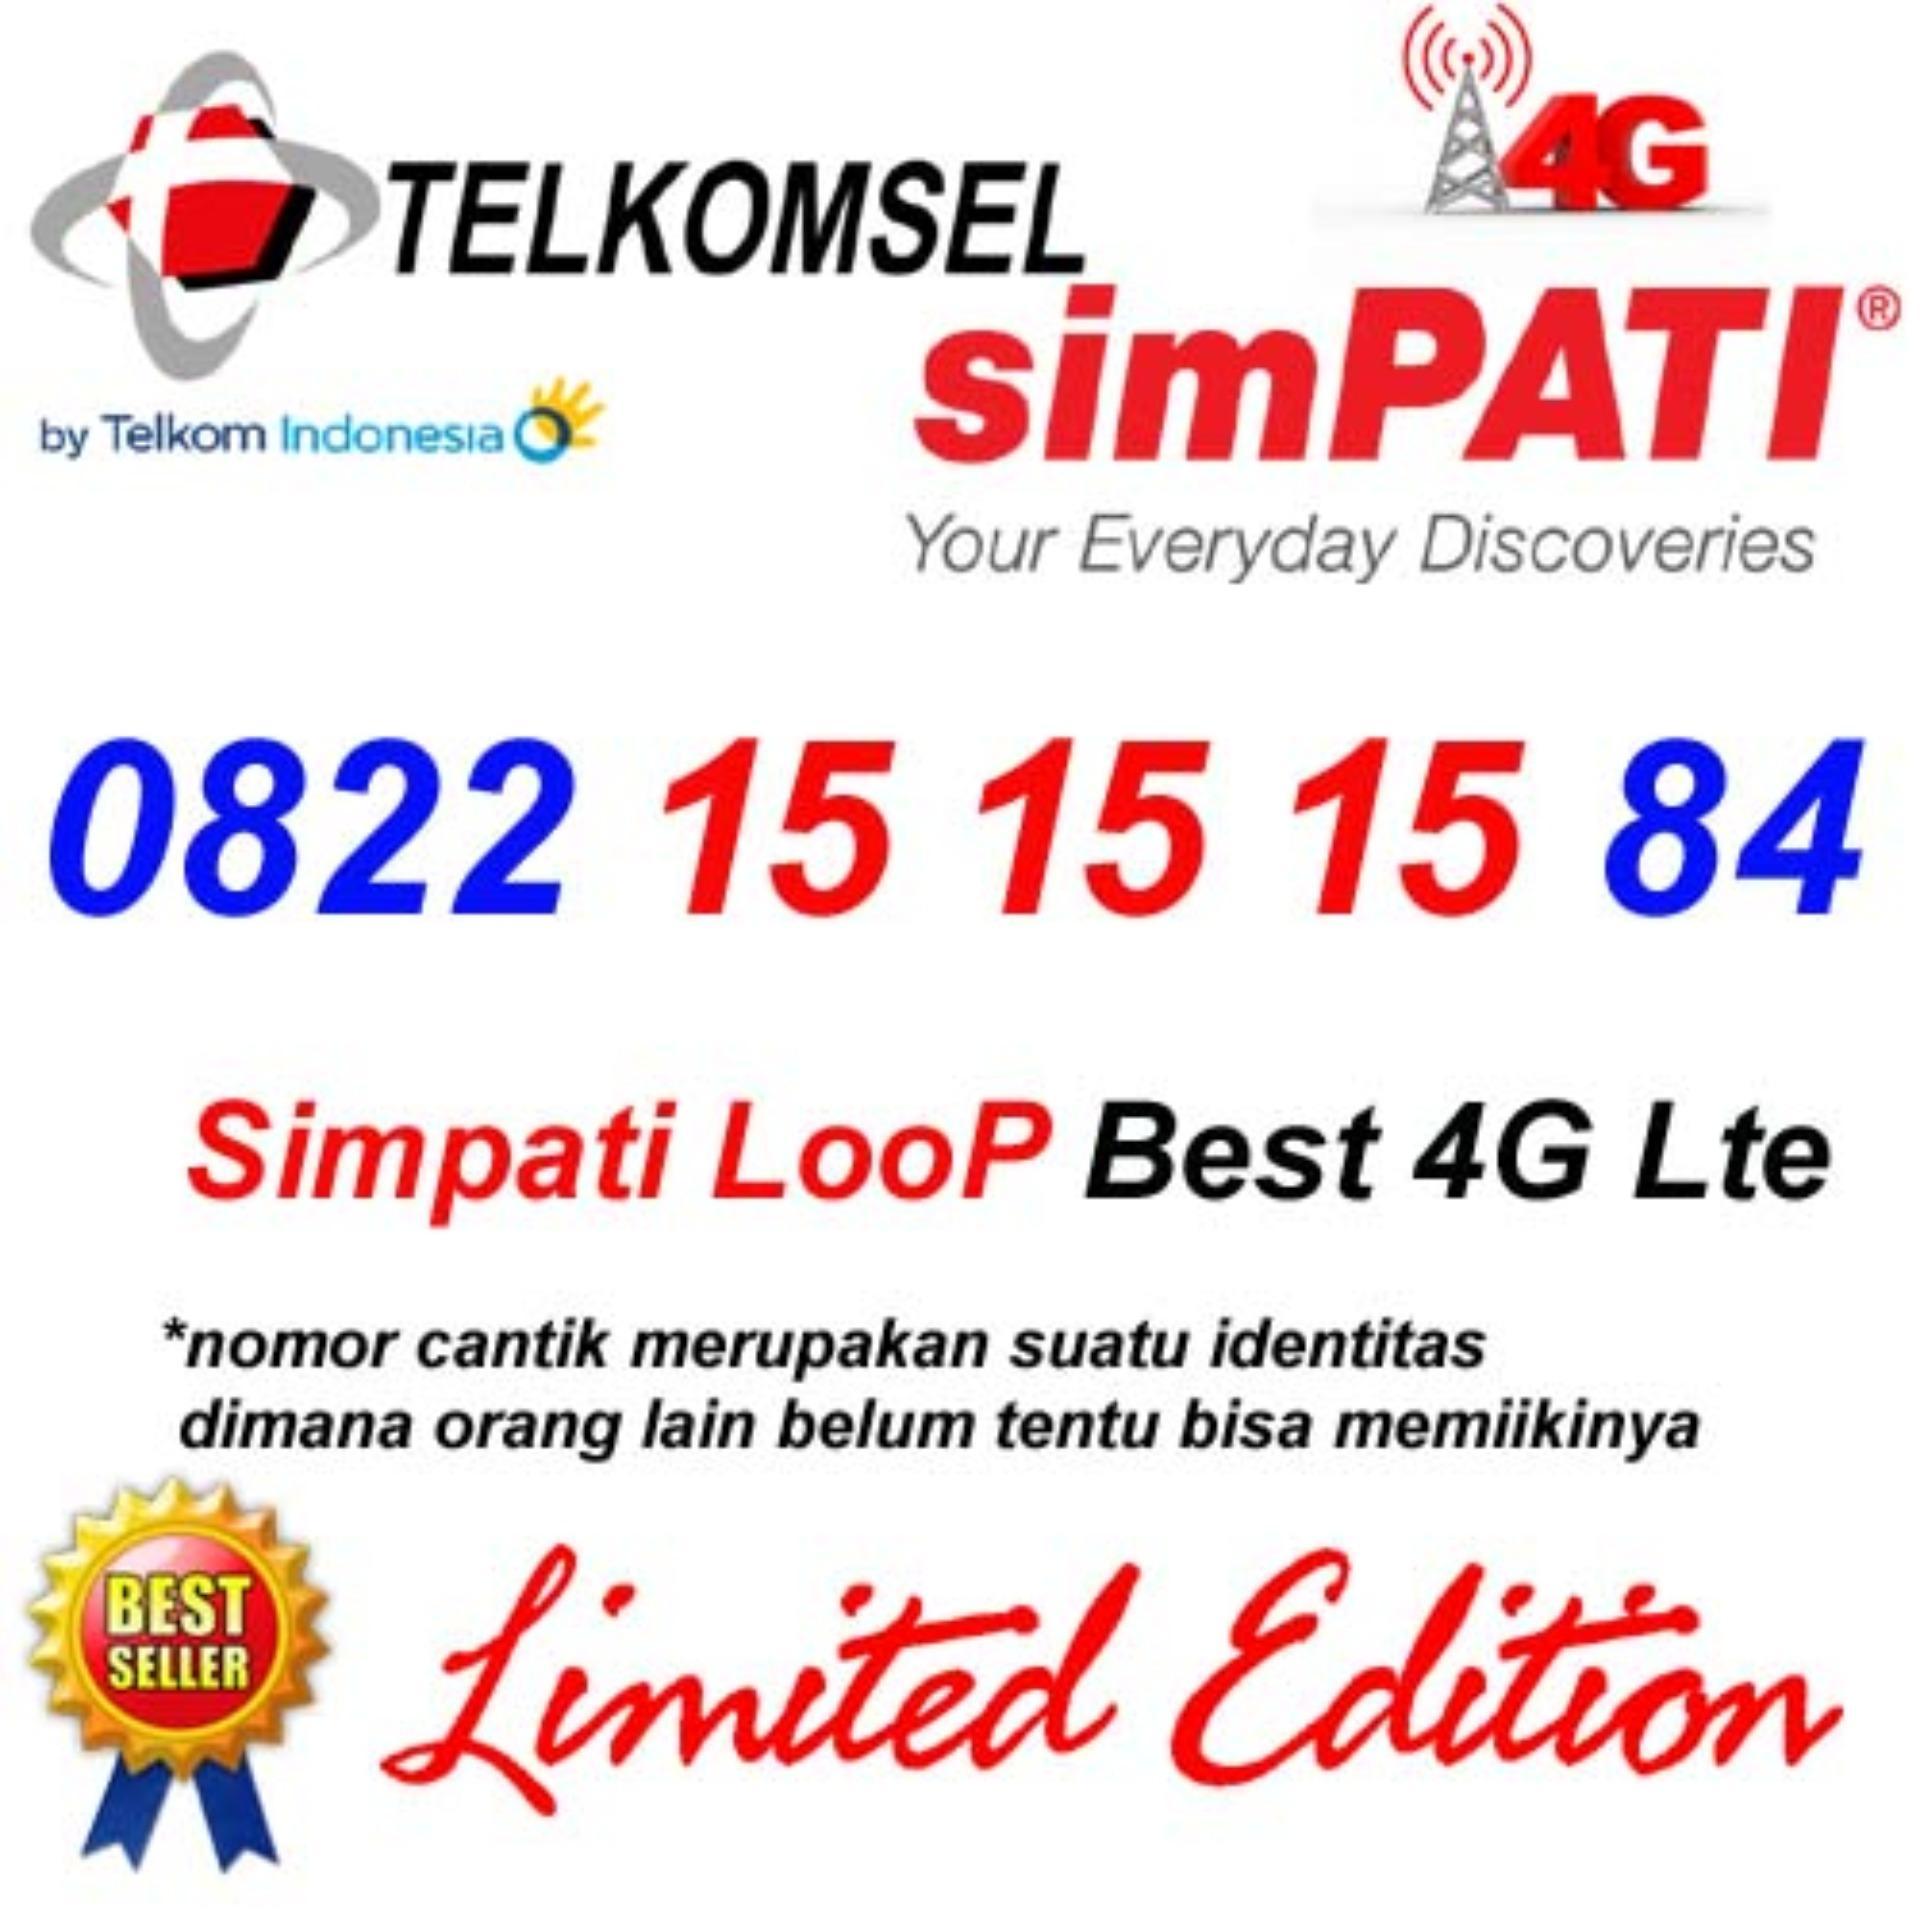 Telkomsel Terlengkap Pulsa Data Rp 150000 Simpati Loop 4g Lte 0822 15 84 Kartu Perdana Nomor Cantik